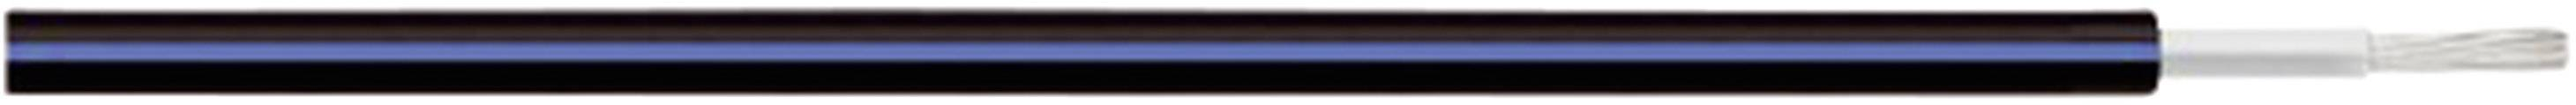 Fotovoltaický kabel ÖLFLEX® SOLAR XLR-R 1 x 4 mm² černá, červená LAPP 0023391 500 m